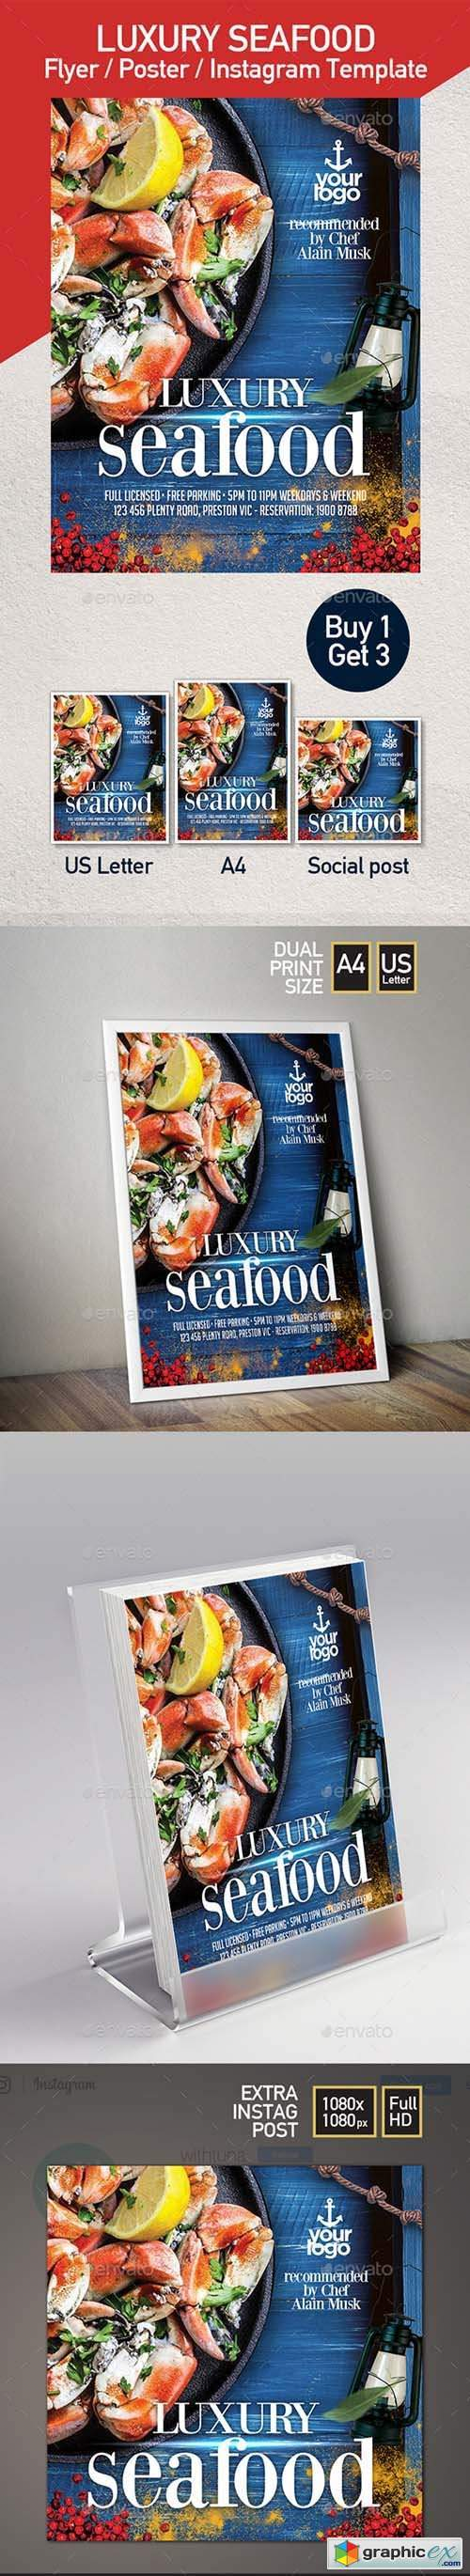 Seafood Restaurant - Set of 3 Flyer Templates